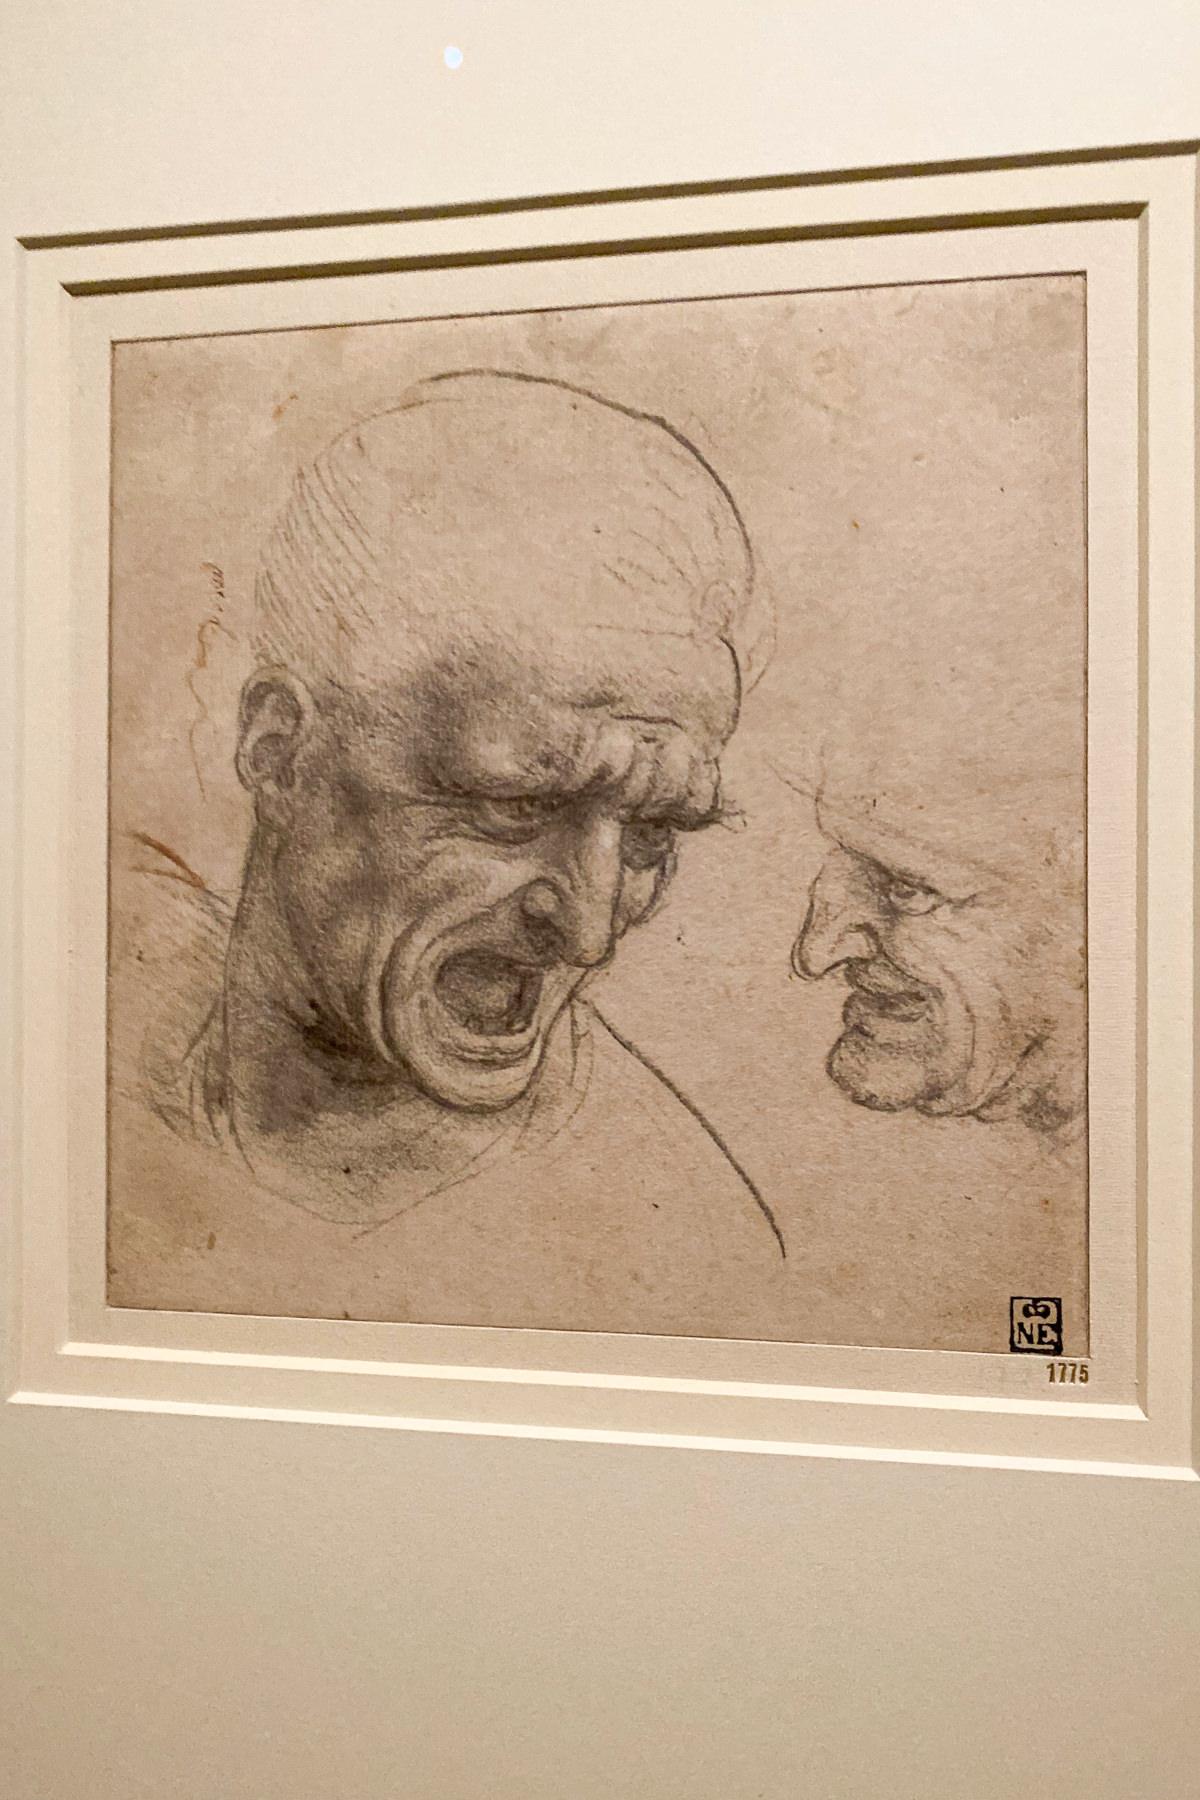 Leonardo da Vinci Exhibition in the Louvre Museum: Study of Two Warriors Heads for the Battle of Anghiari